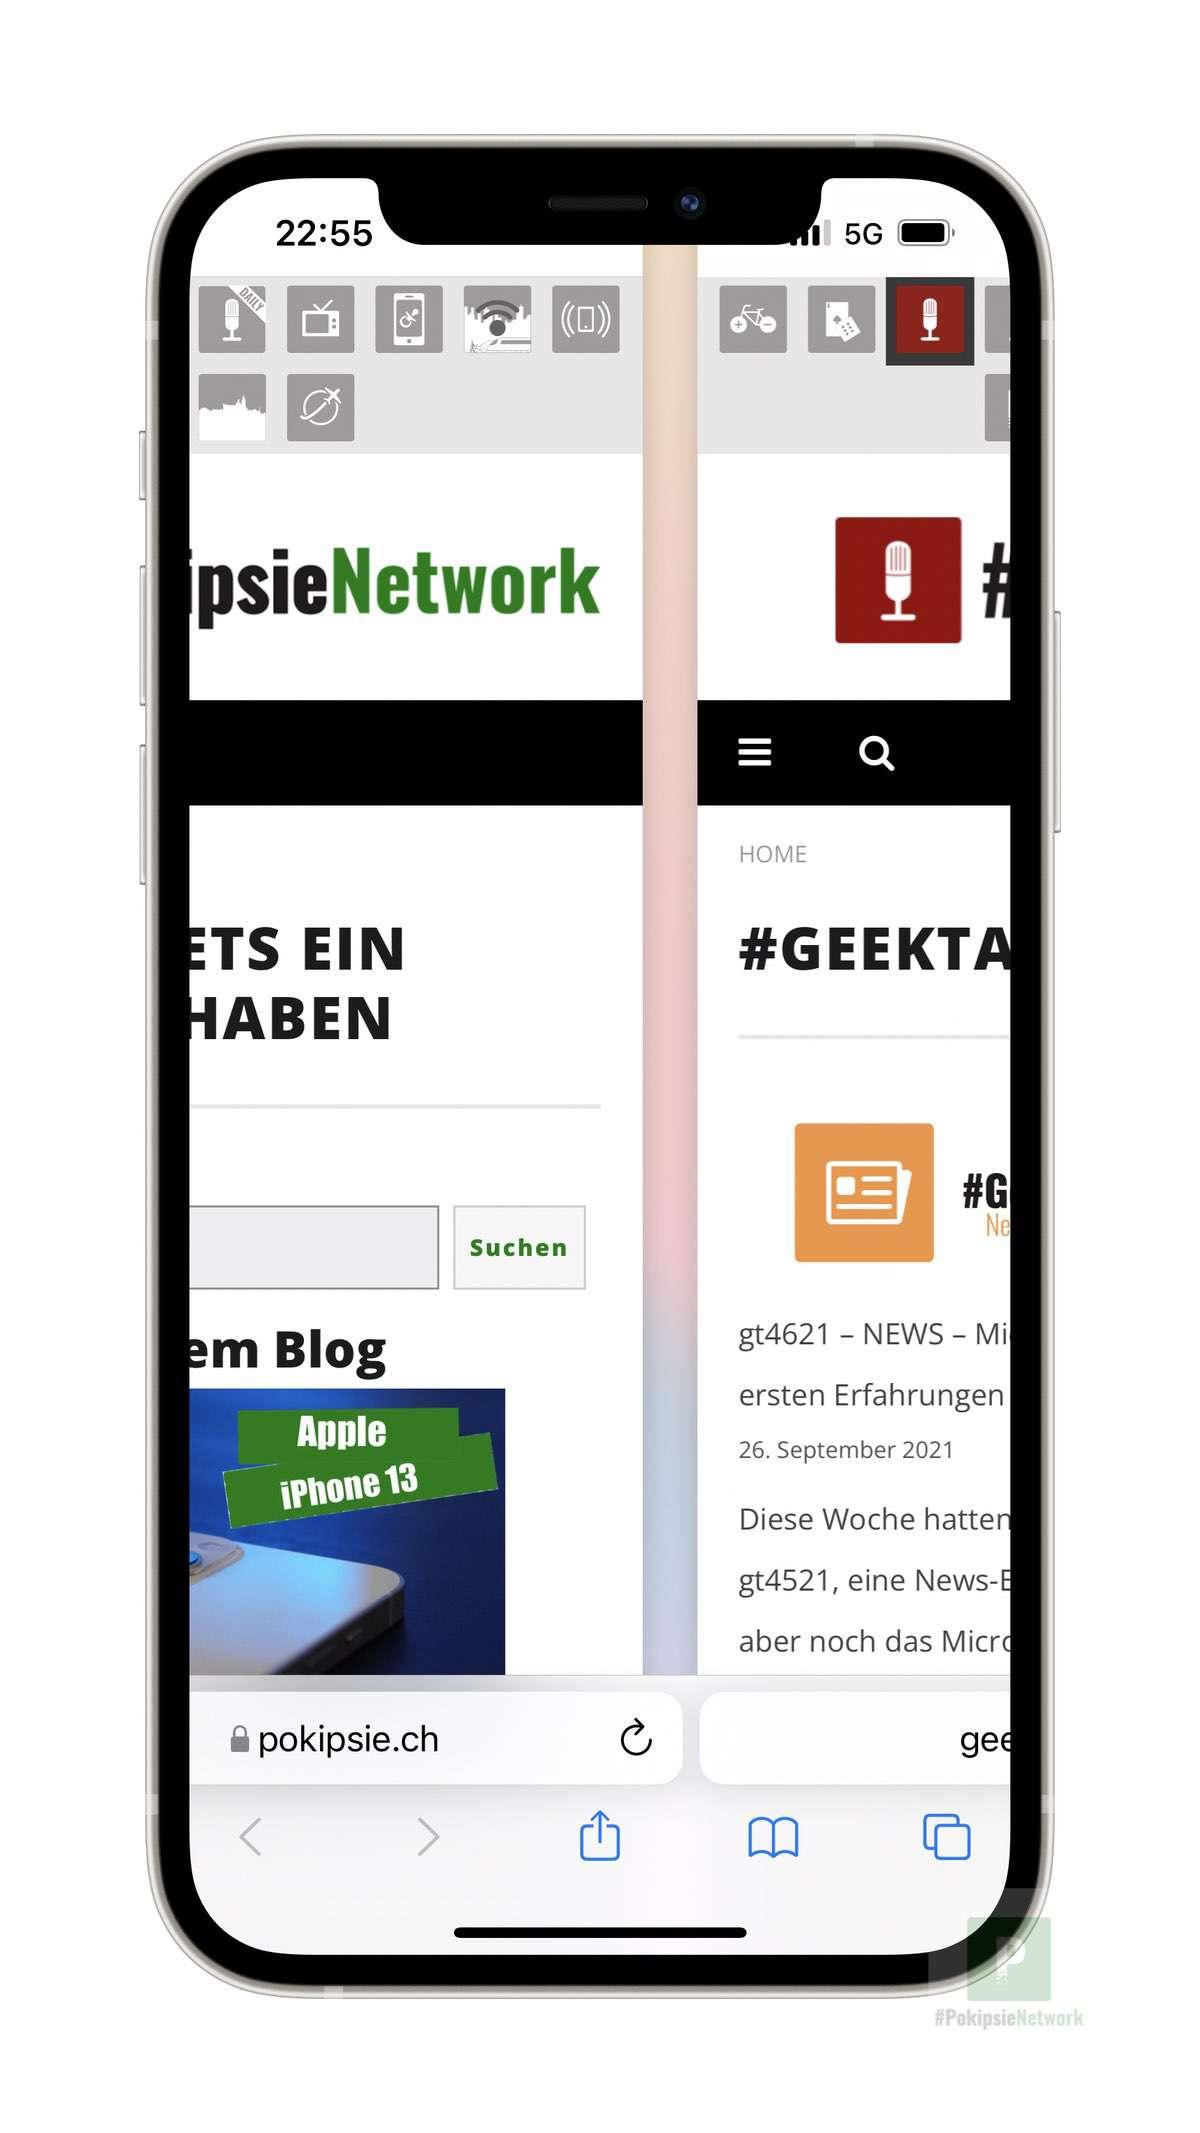 iOS 15 - Safari Tabs